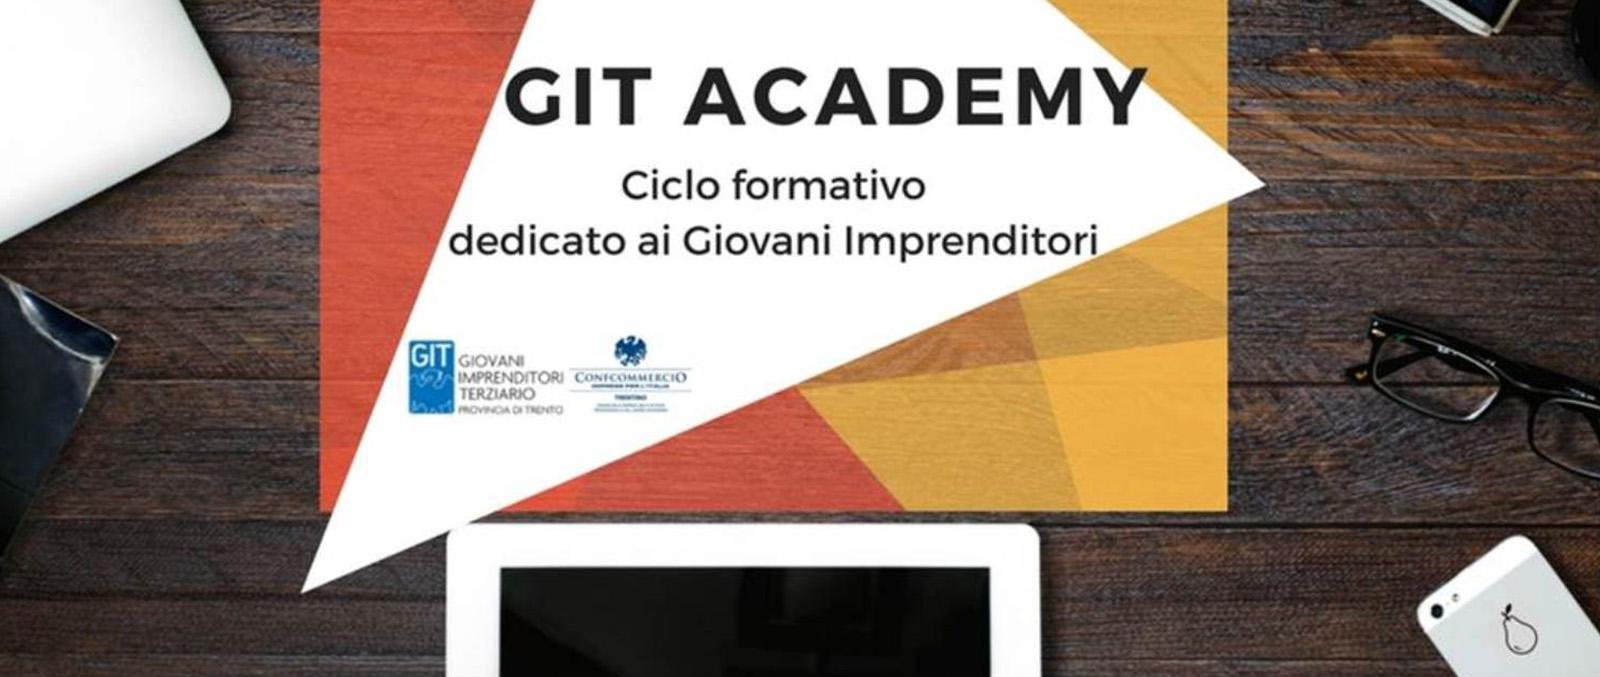 slide-git-academy